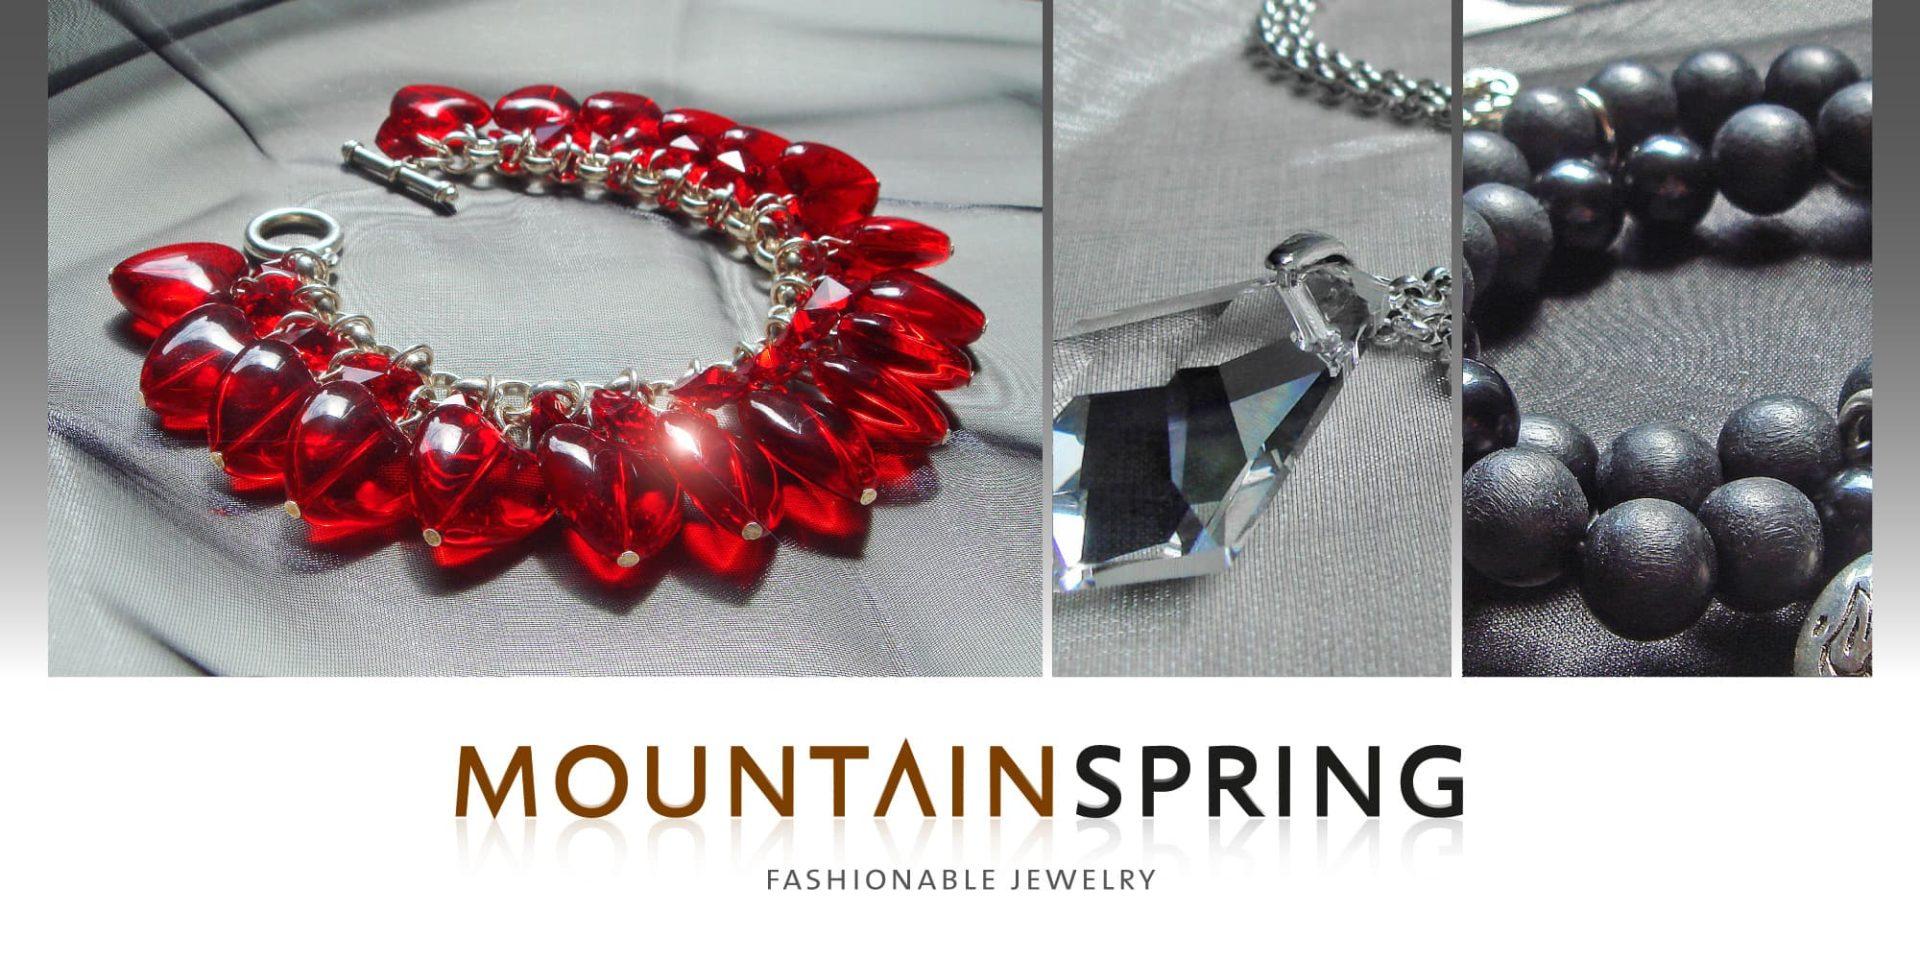 Mountain Spring hoofdbanner - Jeroen Borrenbergs)